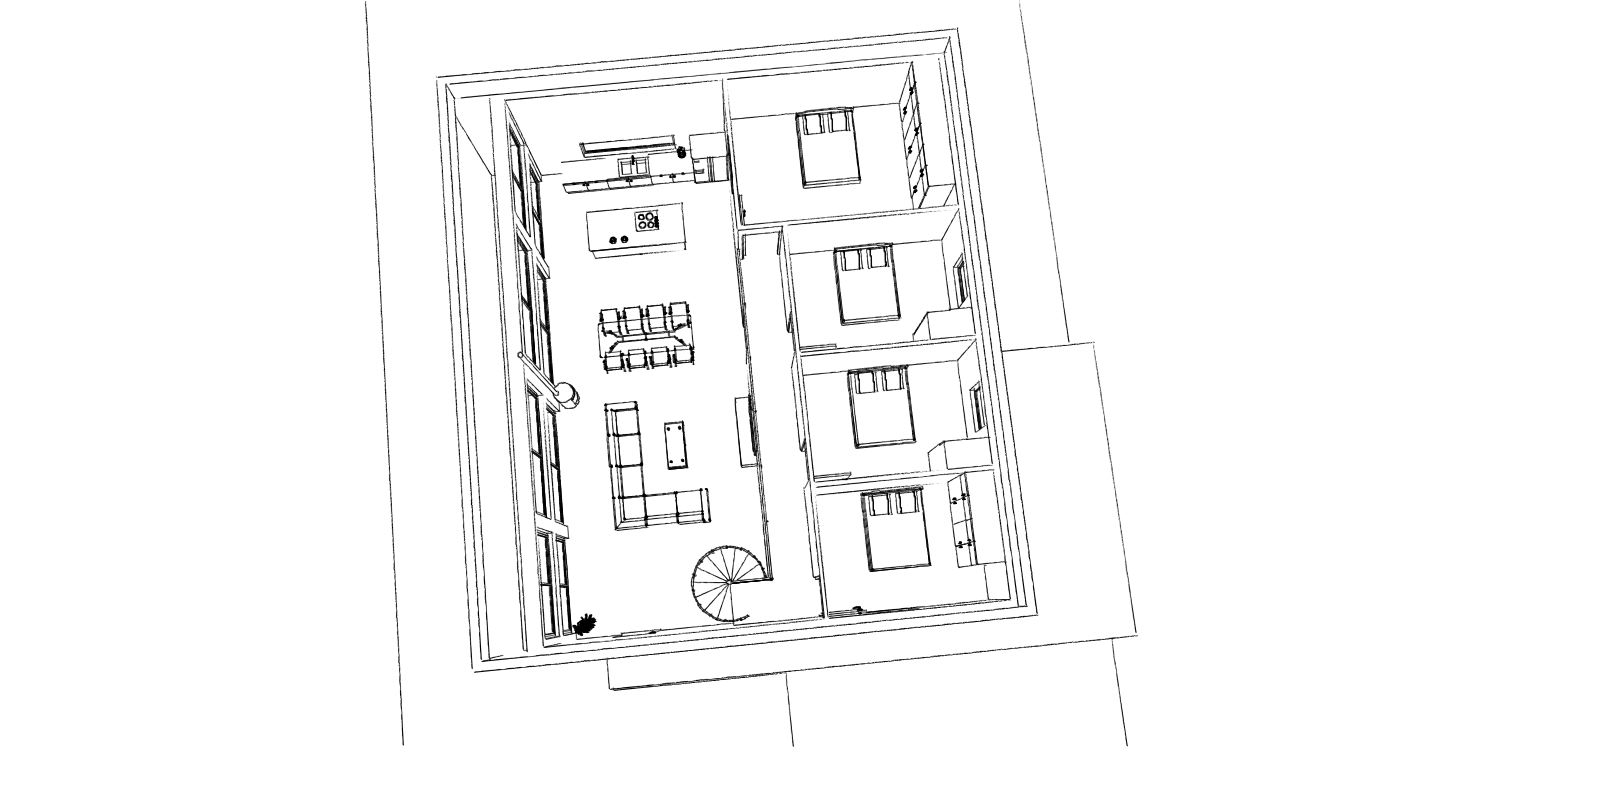 15.17 Permis de construire maison nord Thun Saint Amand3